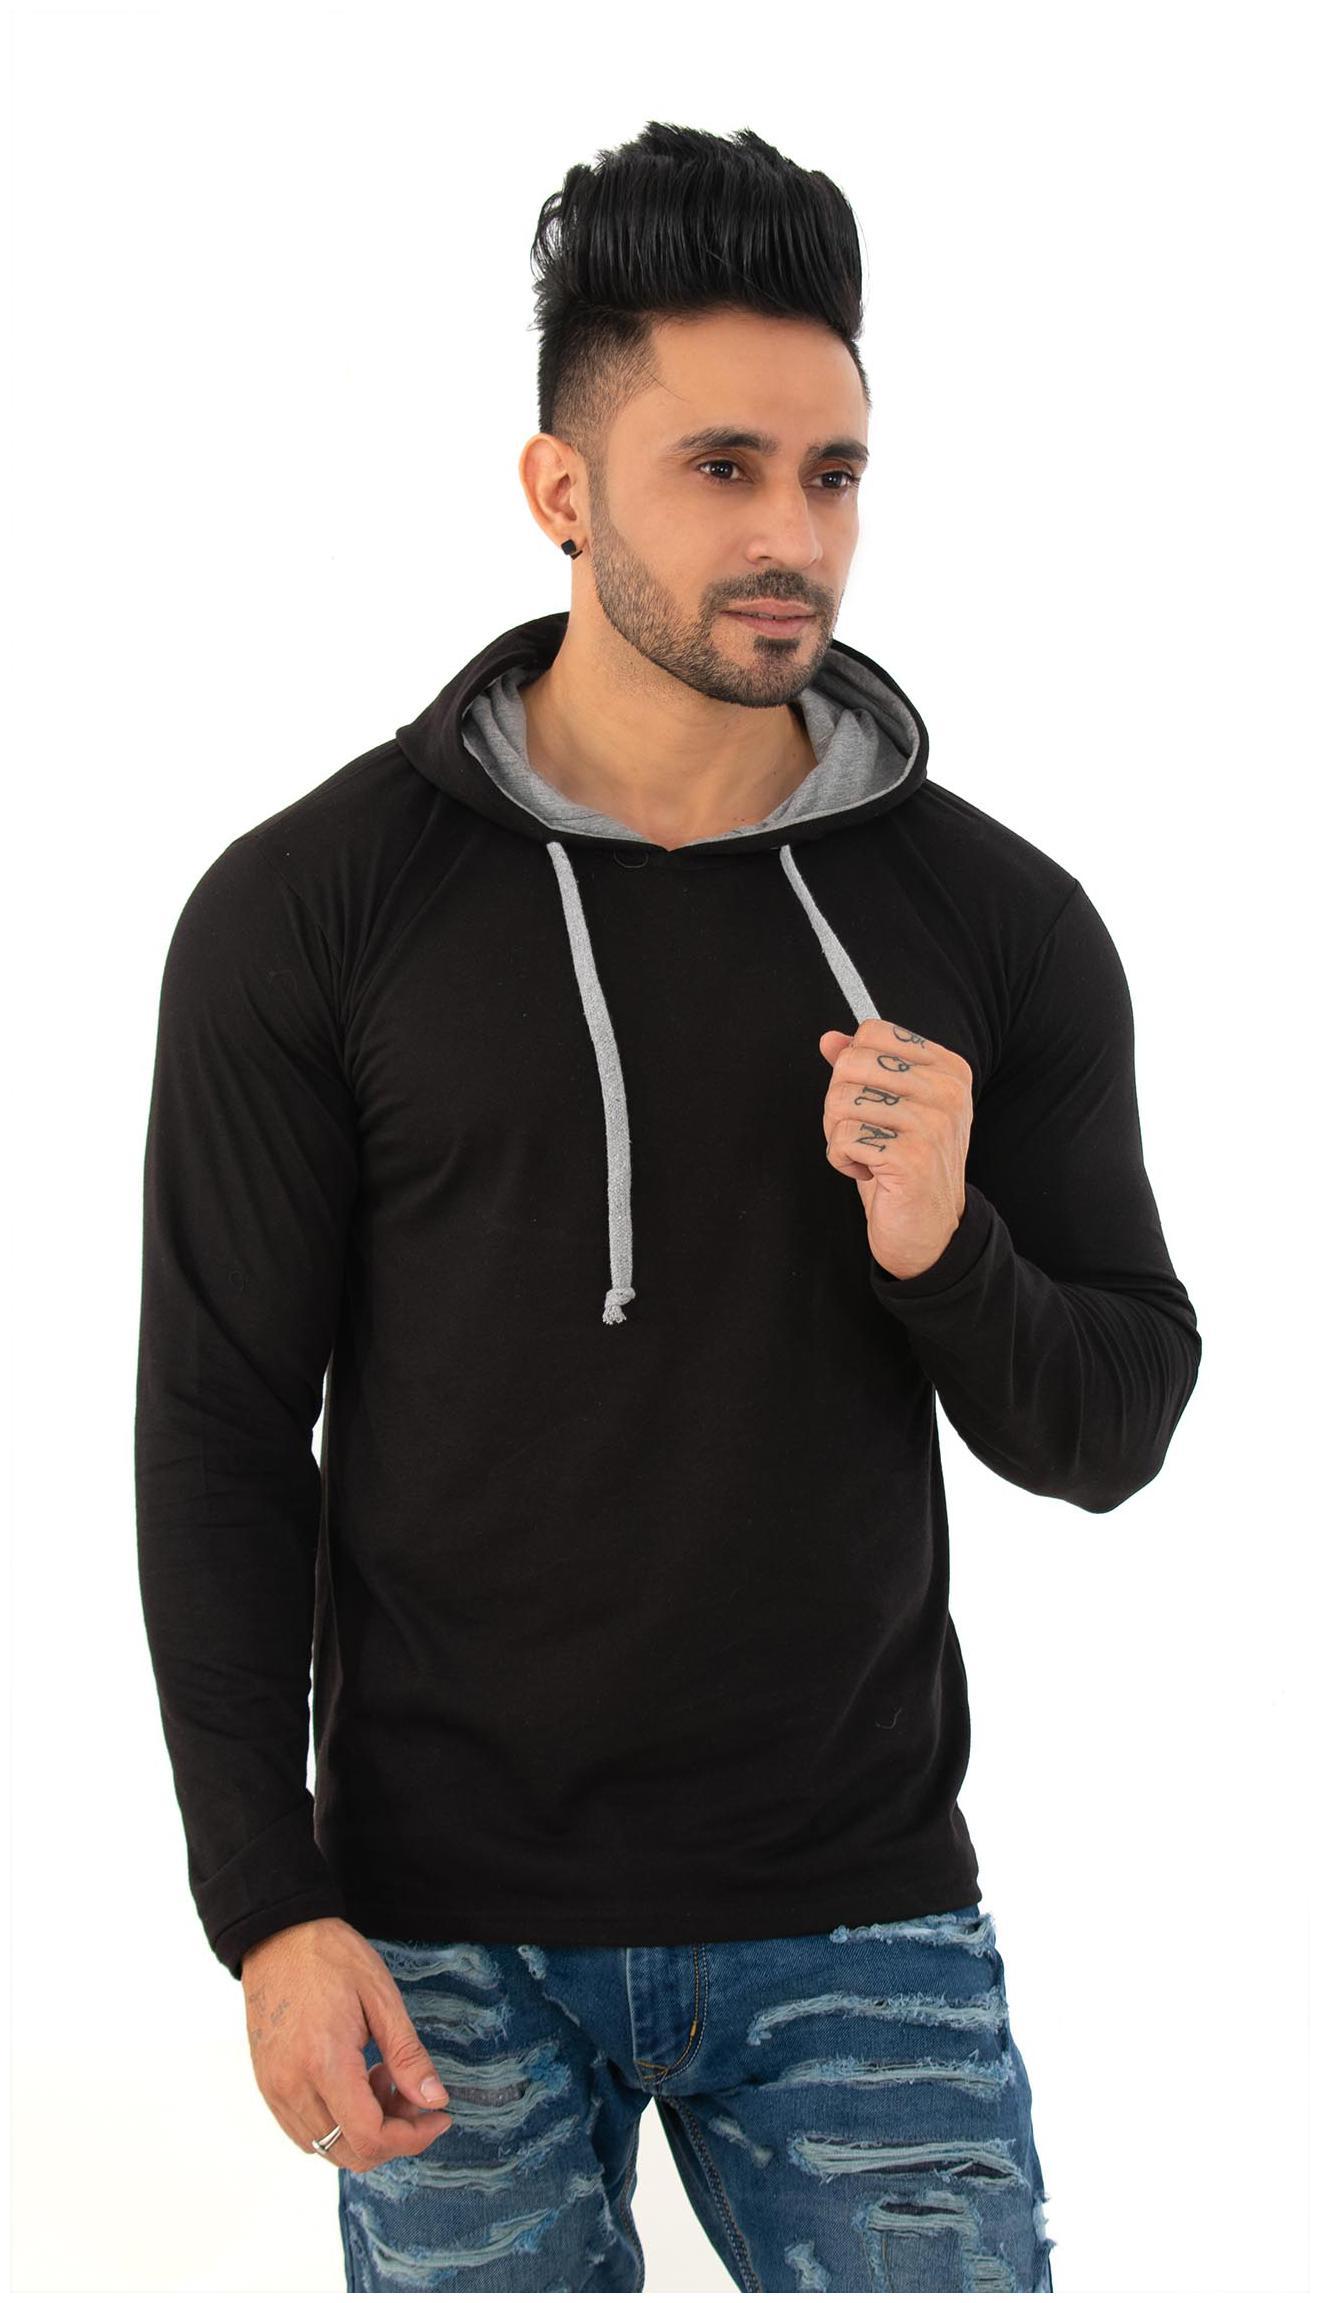 SKYBEN premium quality tshirt with comfort fit and unique design. Black color